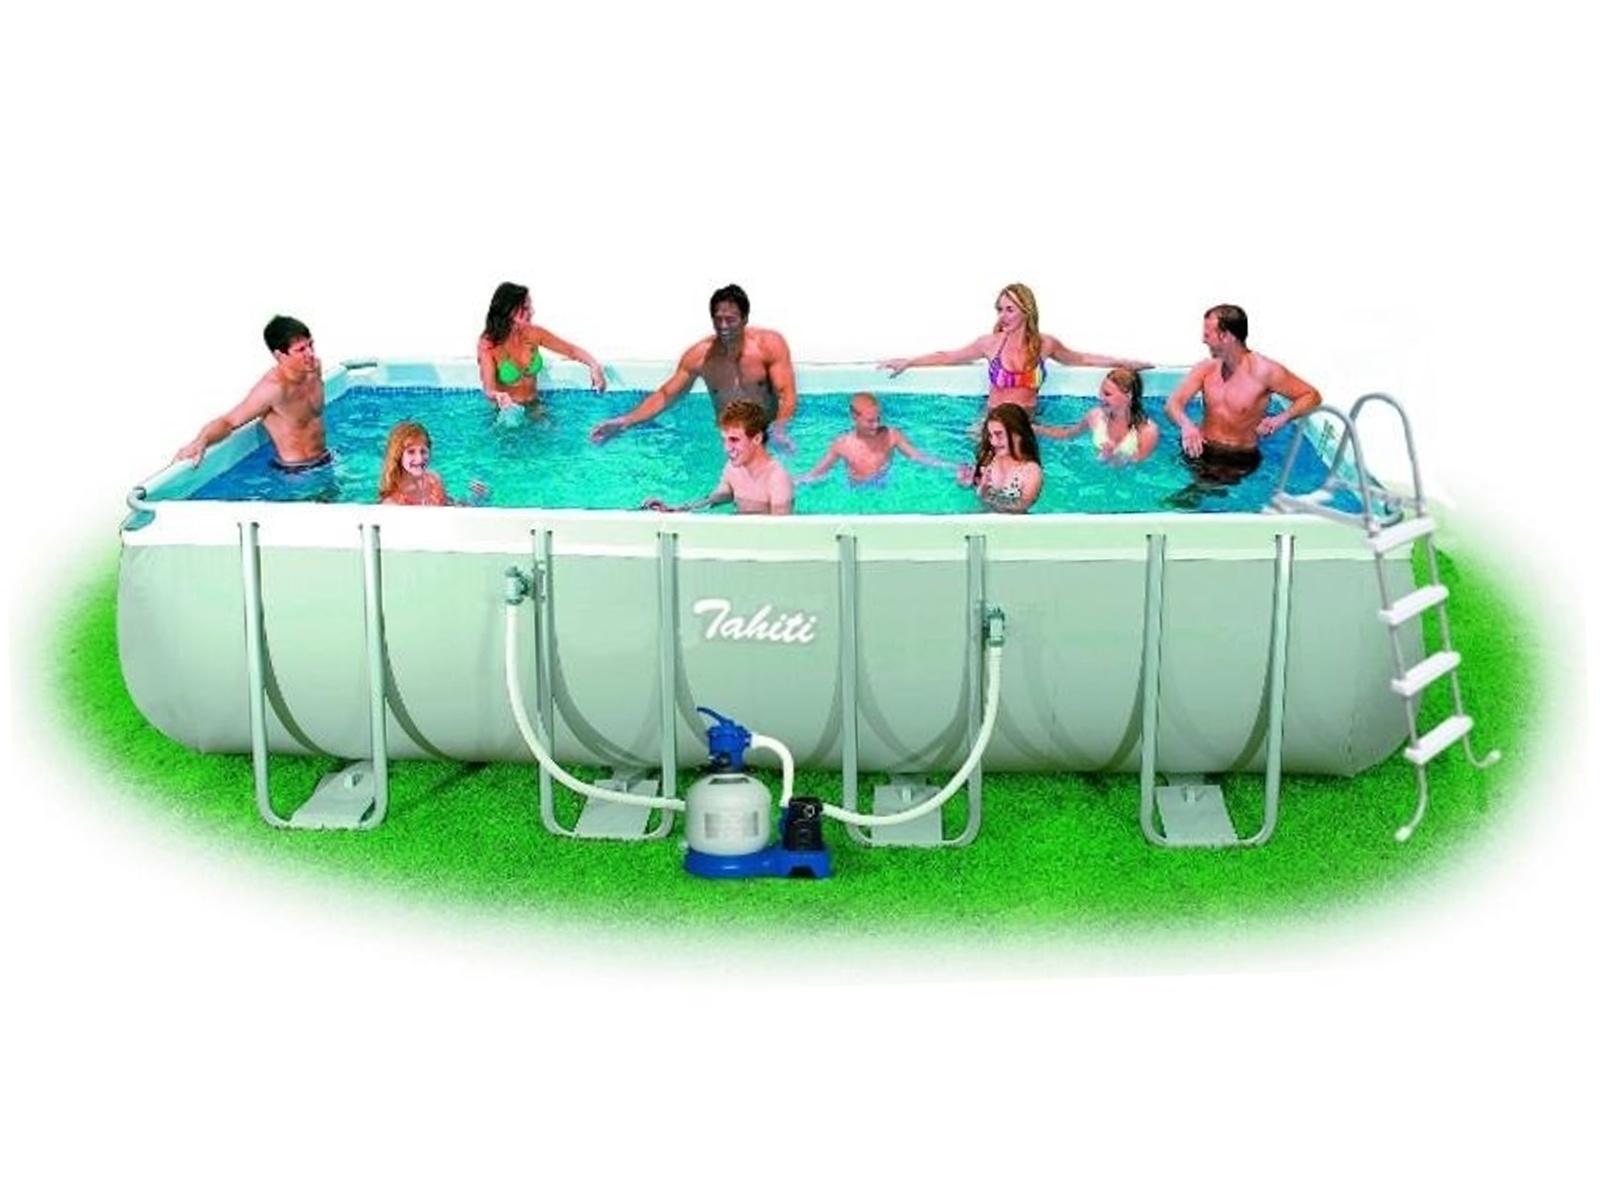 Bazén MARIMEX Florida Premium 274 x 549 x 132 cm set s pískovou filtrací